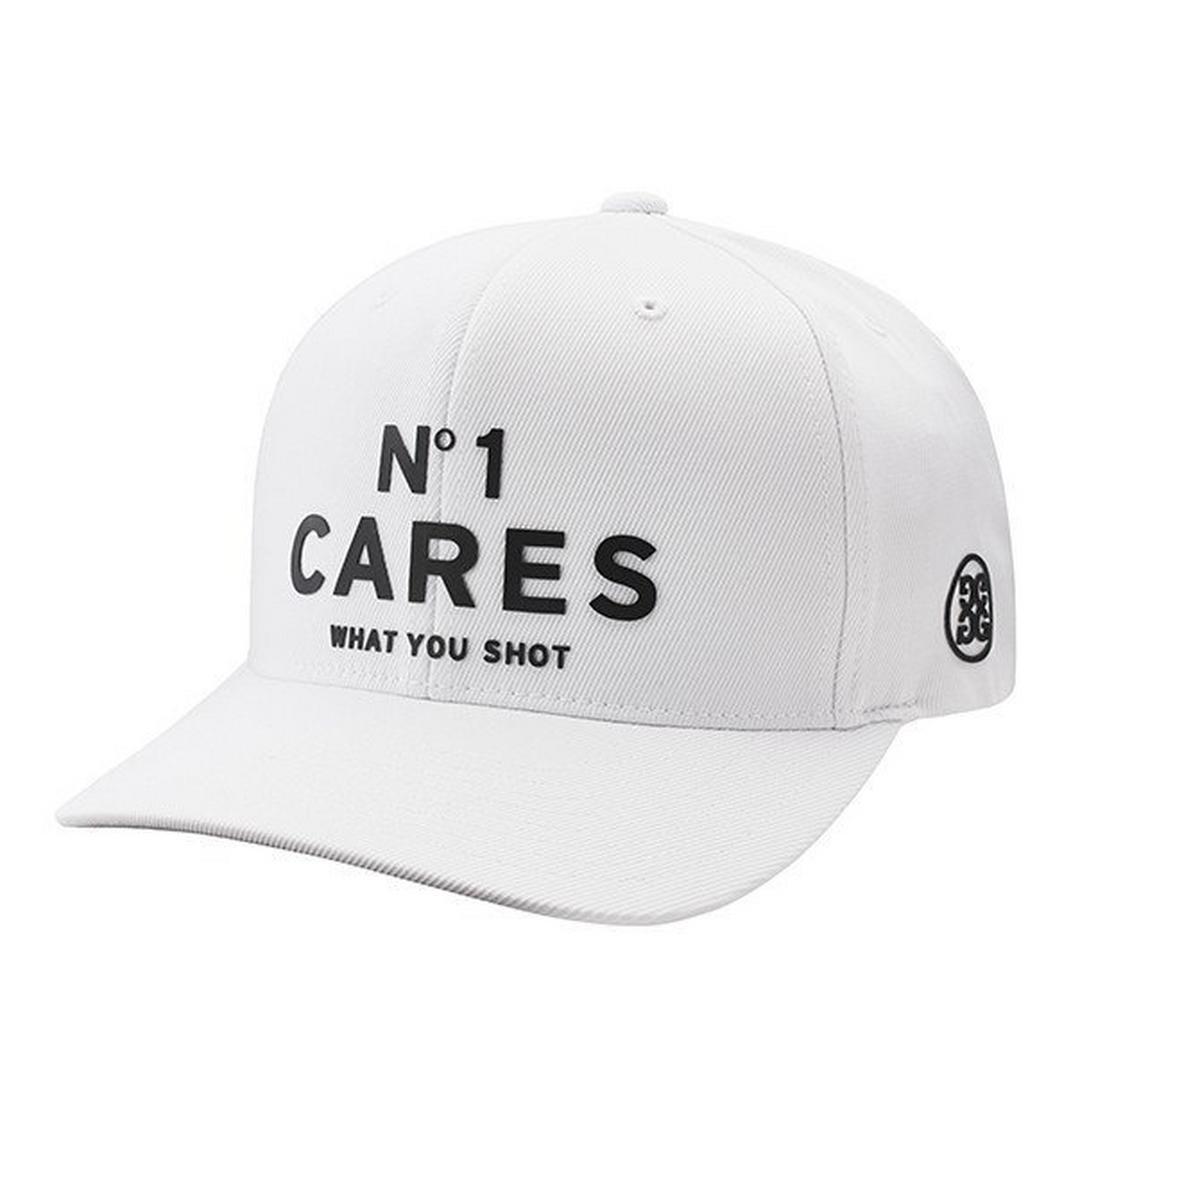 dc71132e75a Men s No 1 Cares Snapback Cap   Golf Town Limited